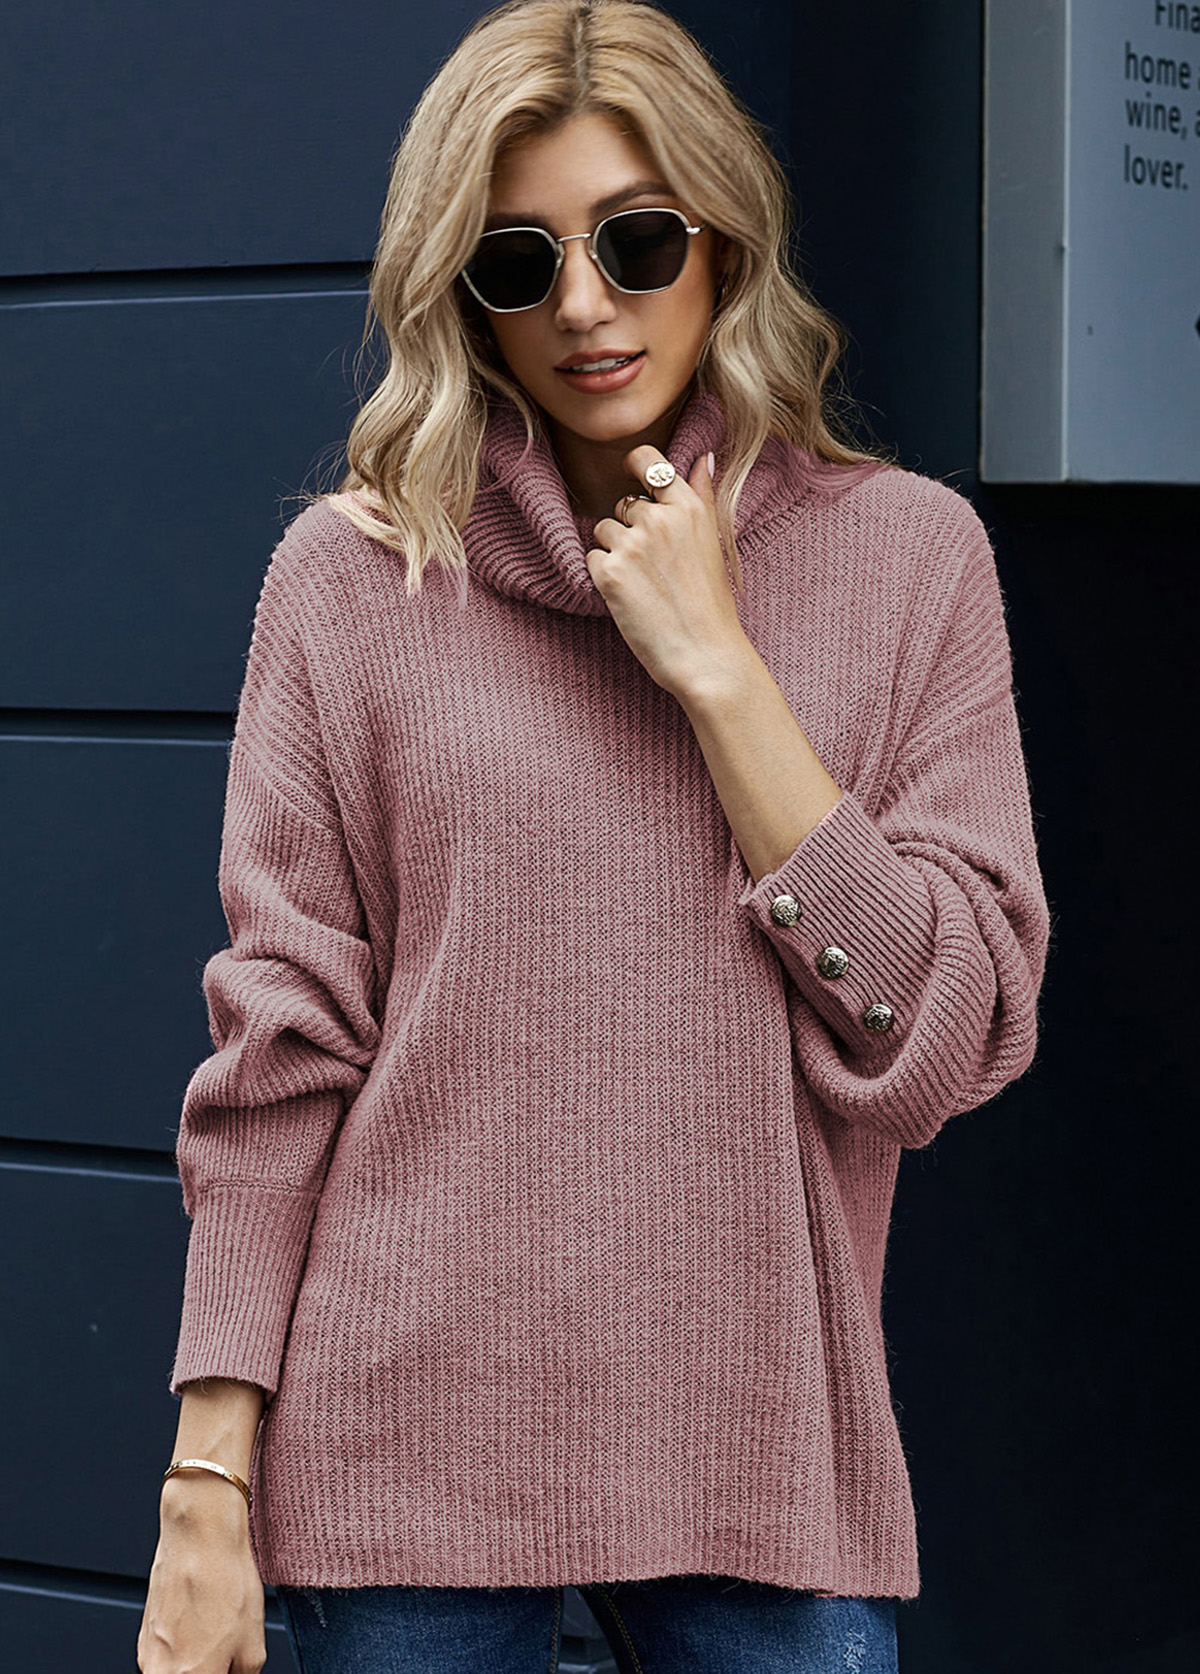 Long Sleeve Turndown Collar Button Sweater